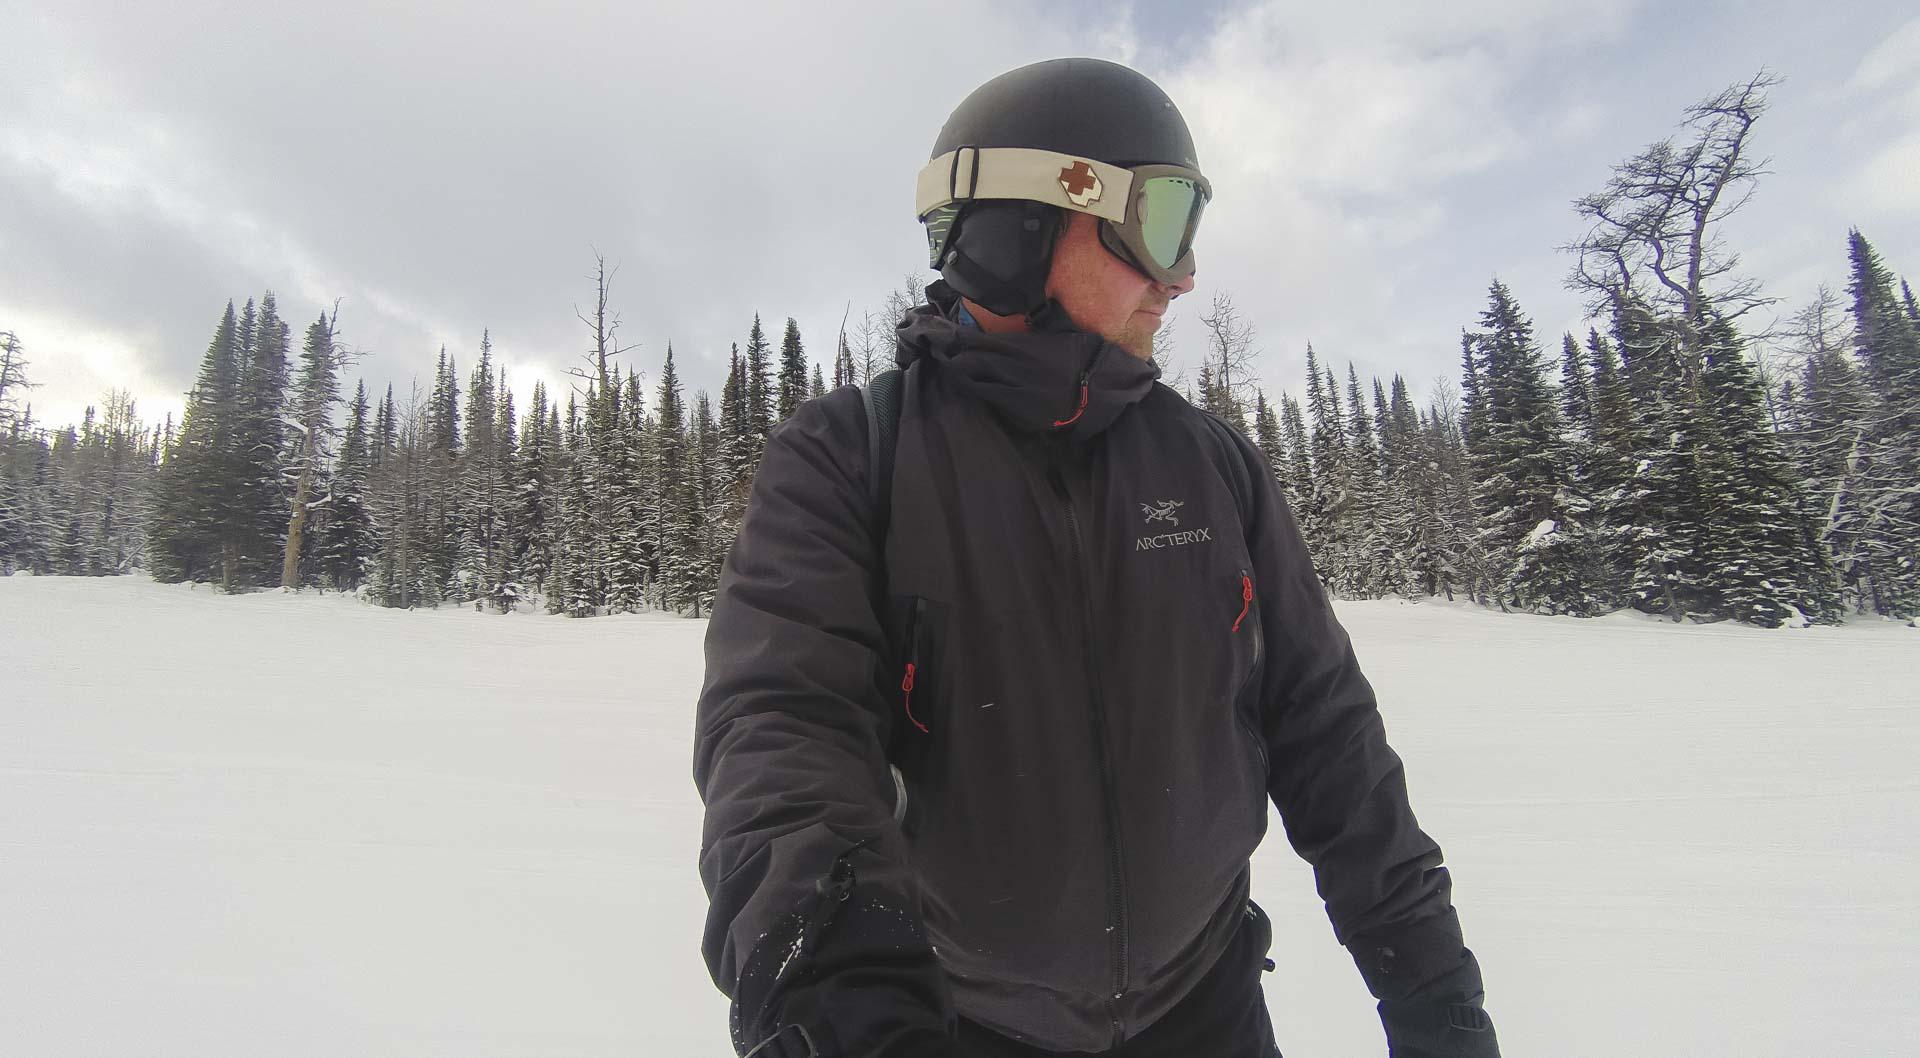 snowboarding in Alberta